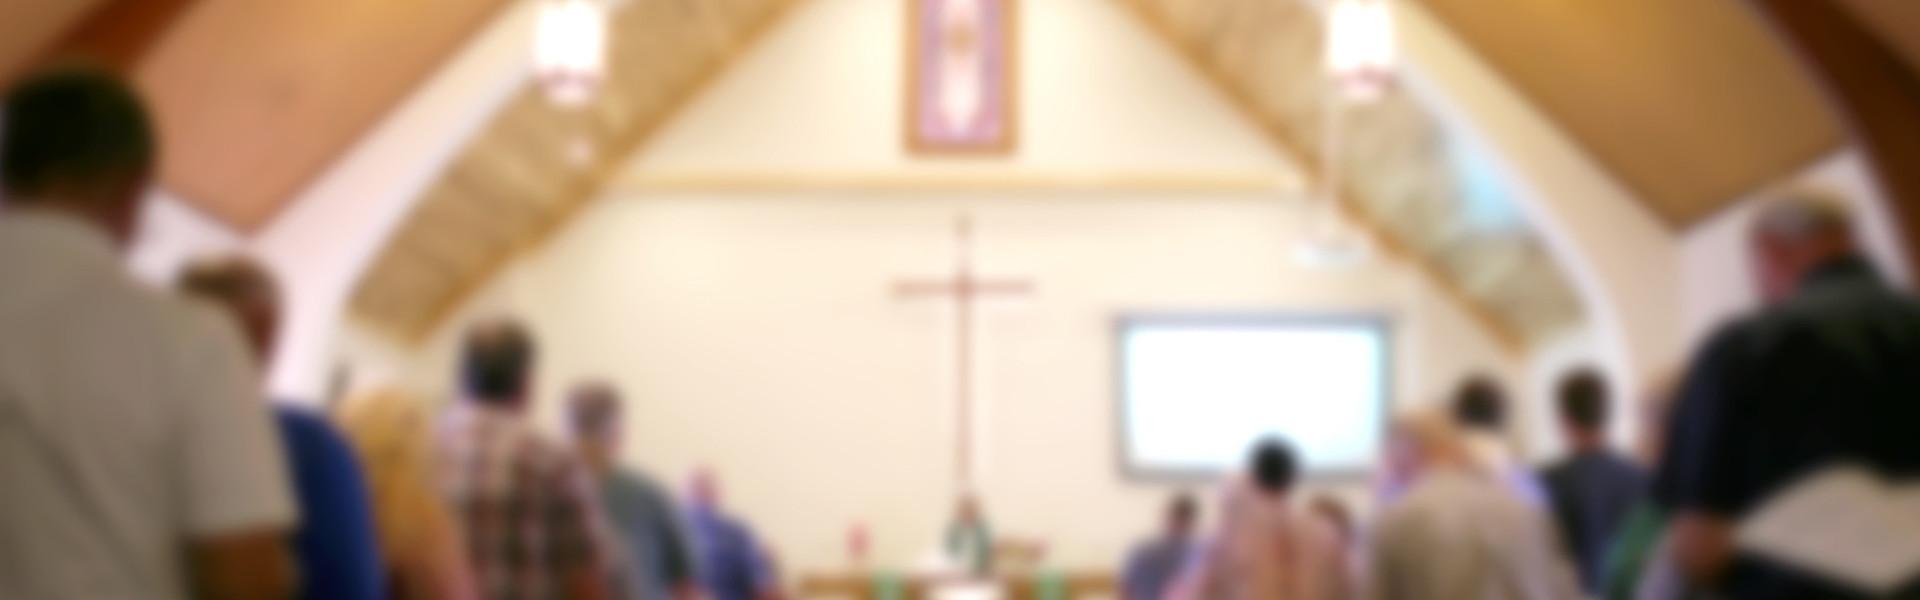 Church Retreats In Orlando - Inside of a Church